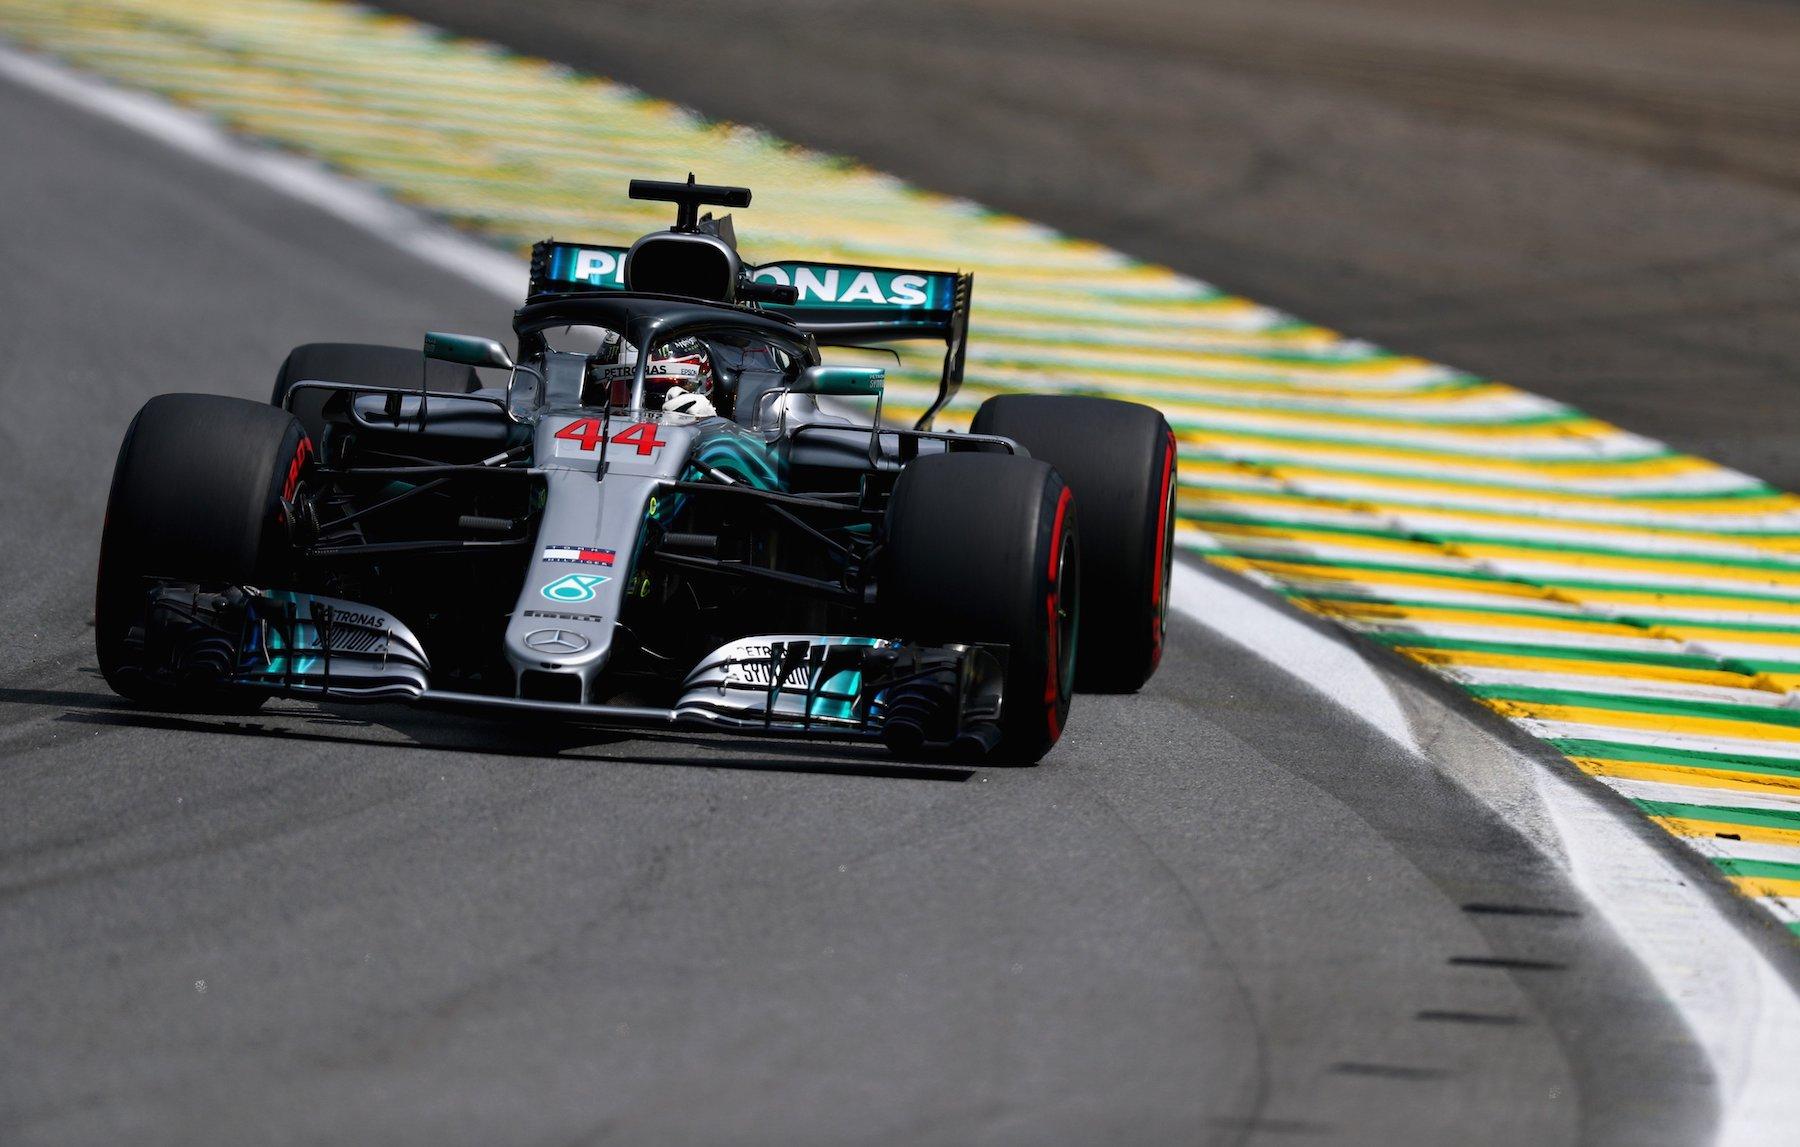 2 2018 Lewis Hamilton | Mercedes W09 | 2018 Brazilian GP Q3 Pole 1 copy.jpg